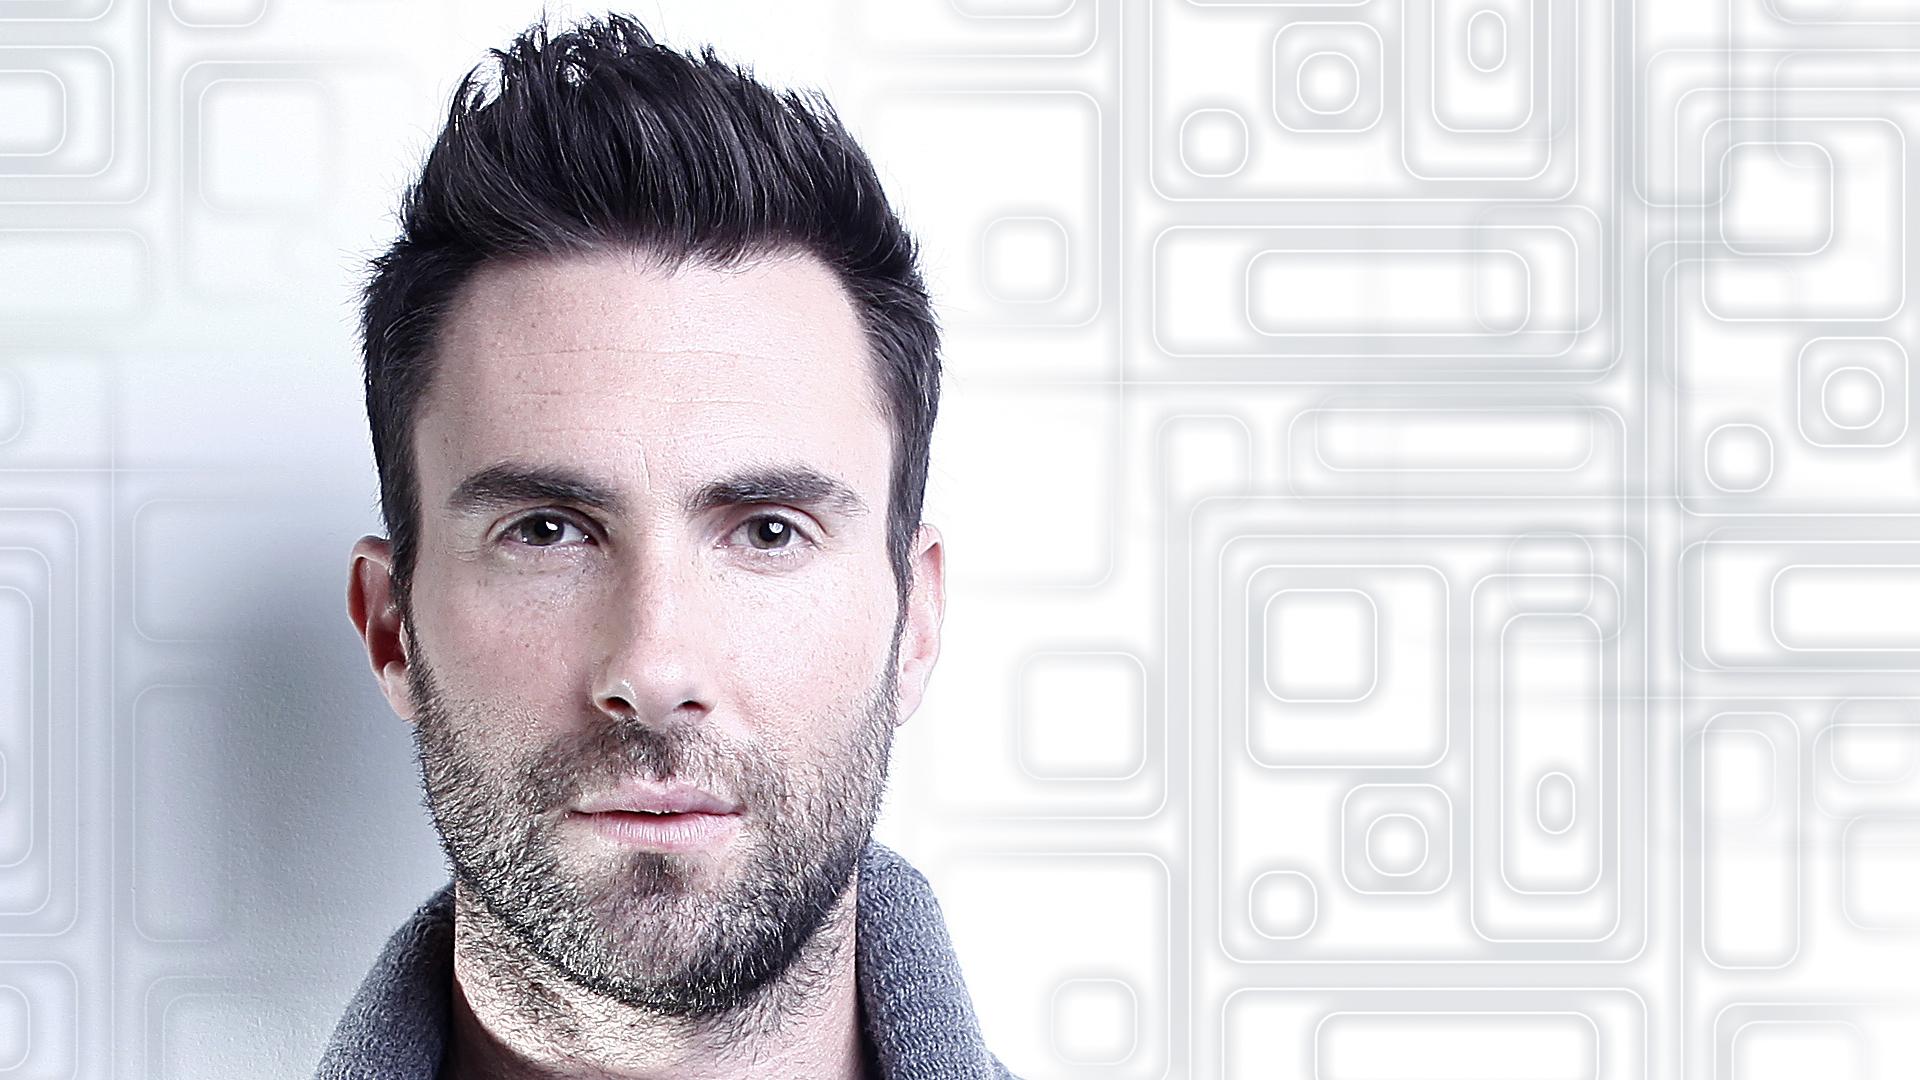 Adam-Levine-HD-Wallpapers.jpg